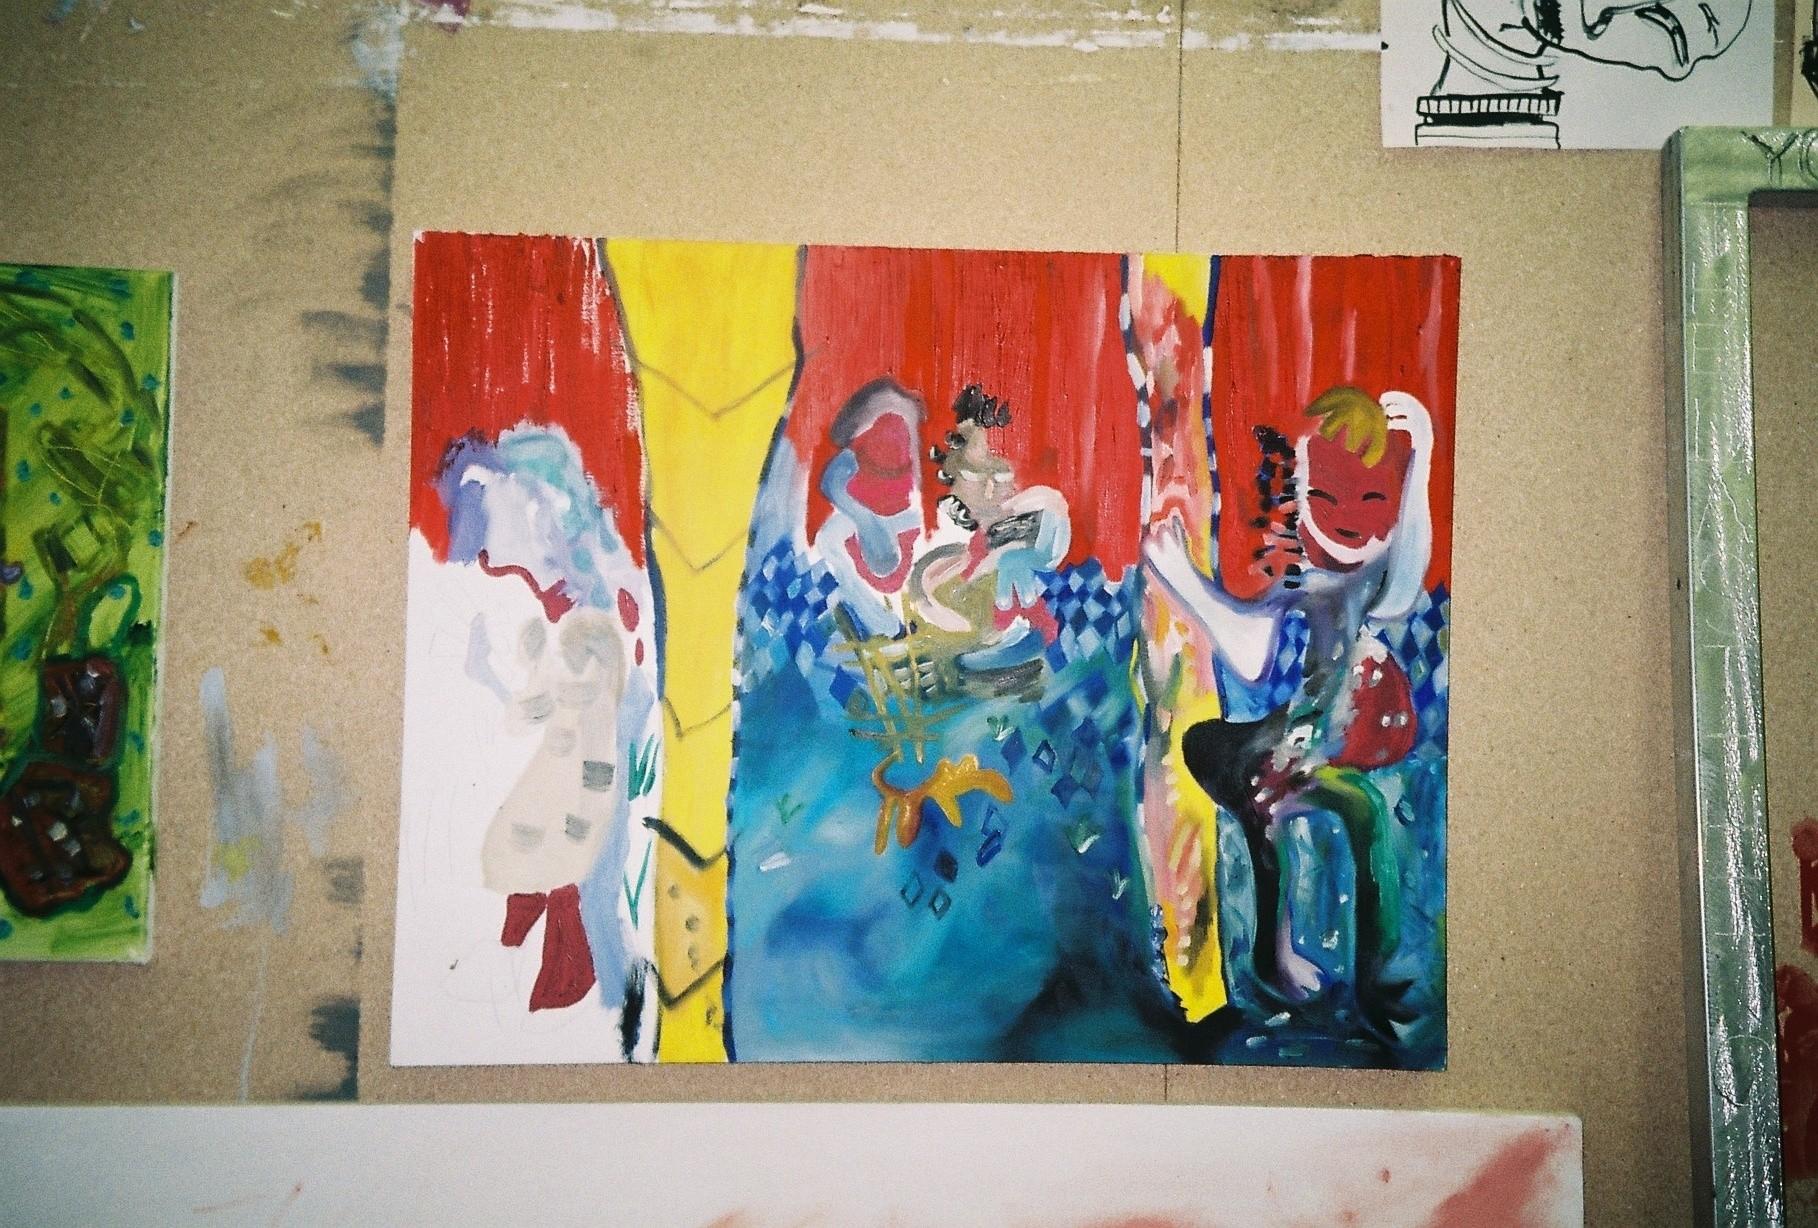 Modern Art Addressing Race Issues